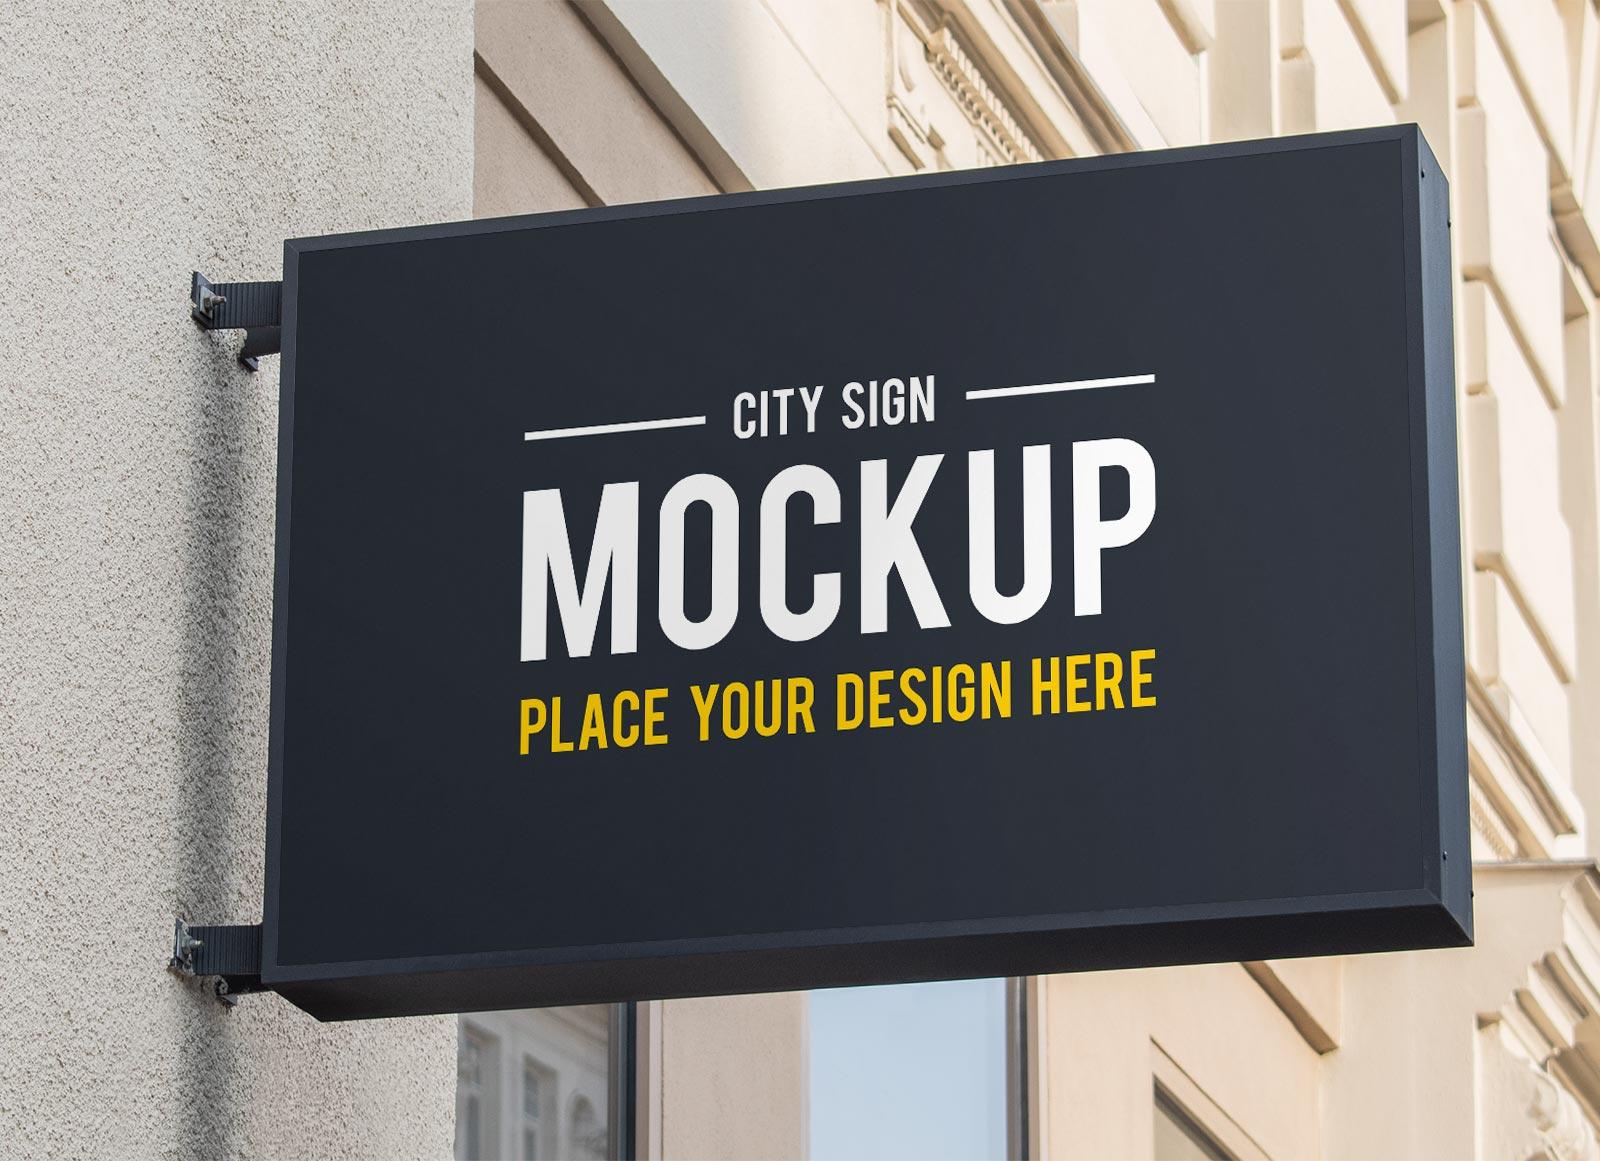 Free-Rectangle-Wall-Mounted-Signage-Mockup-PSD